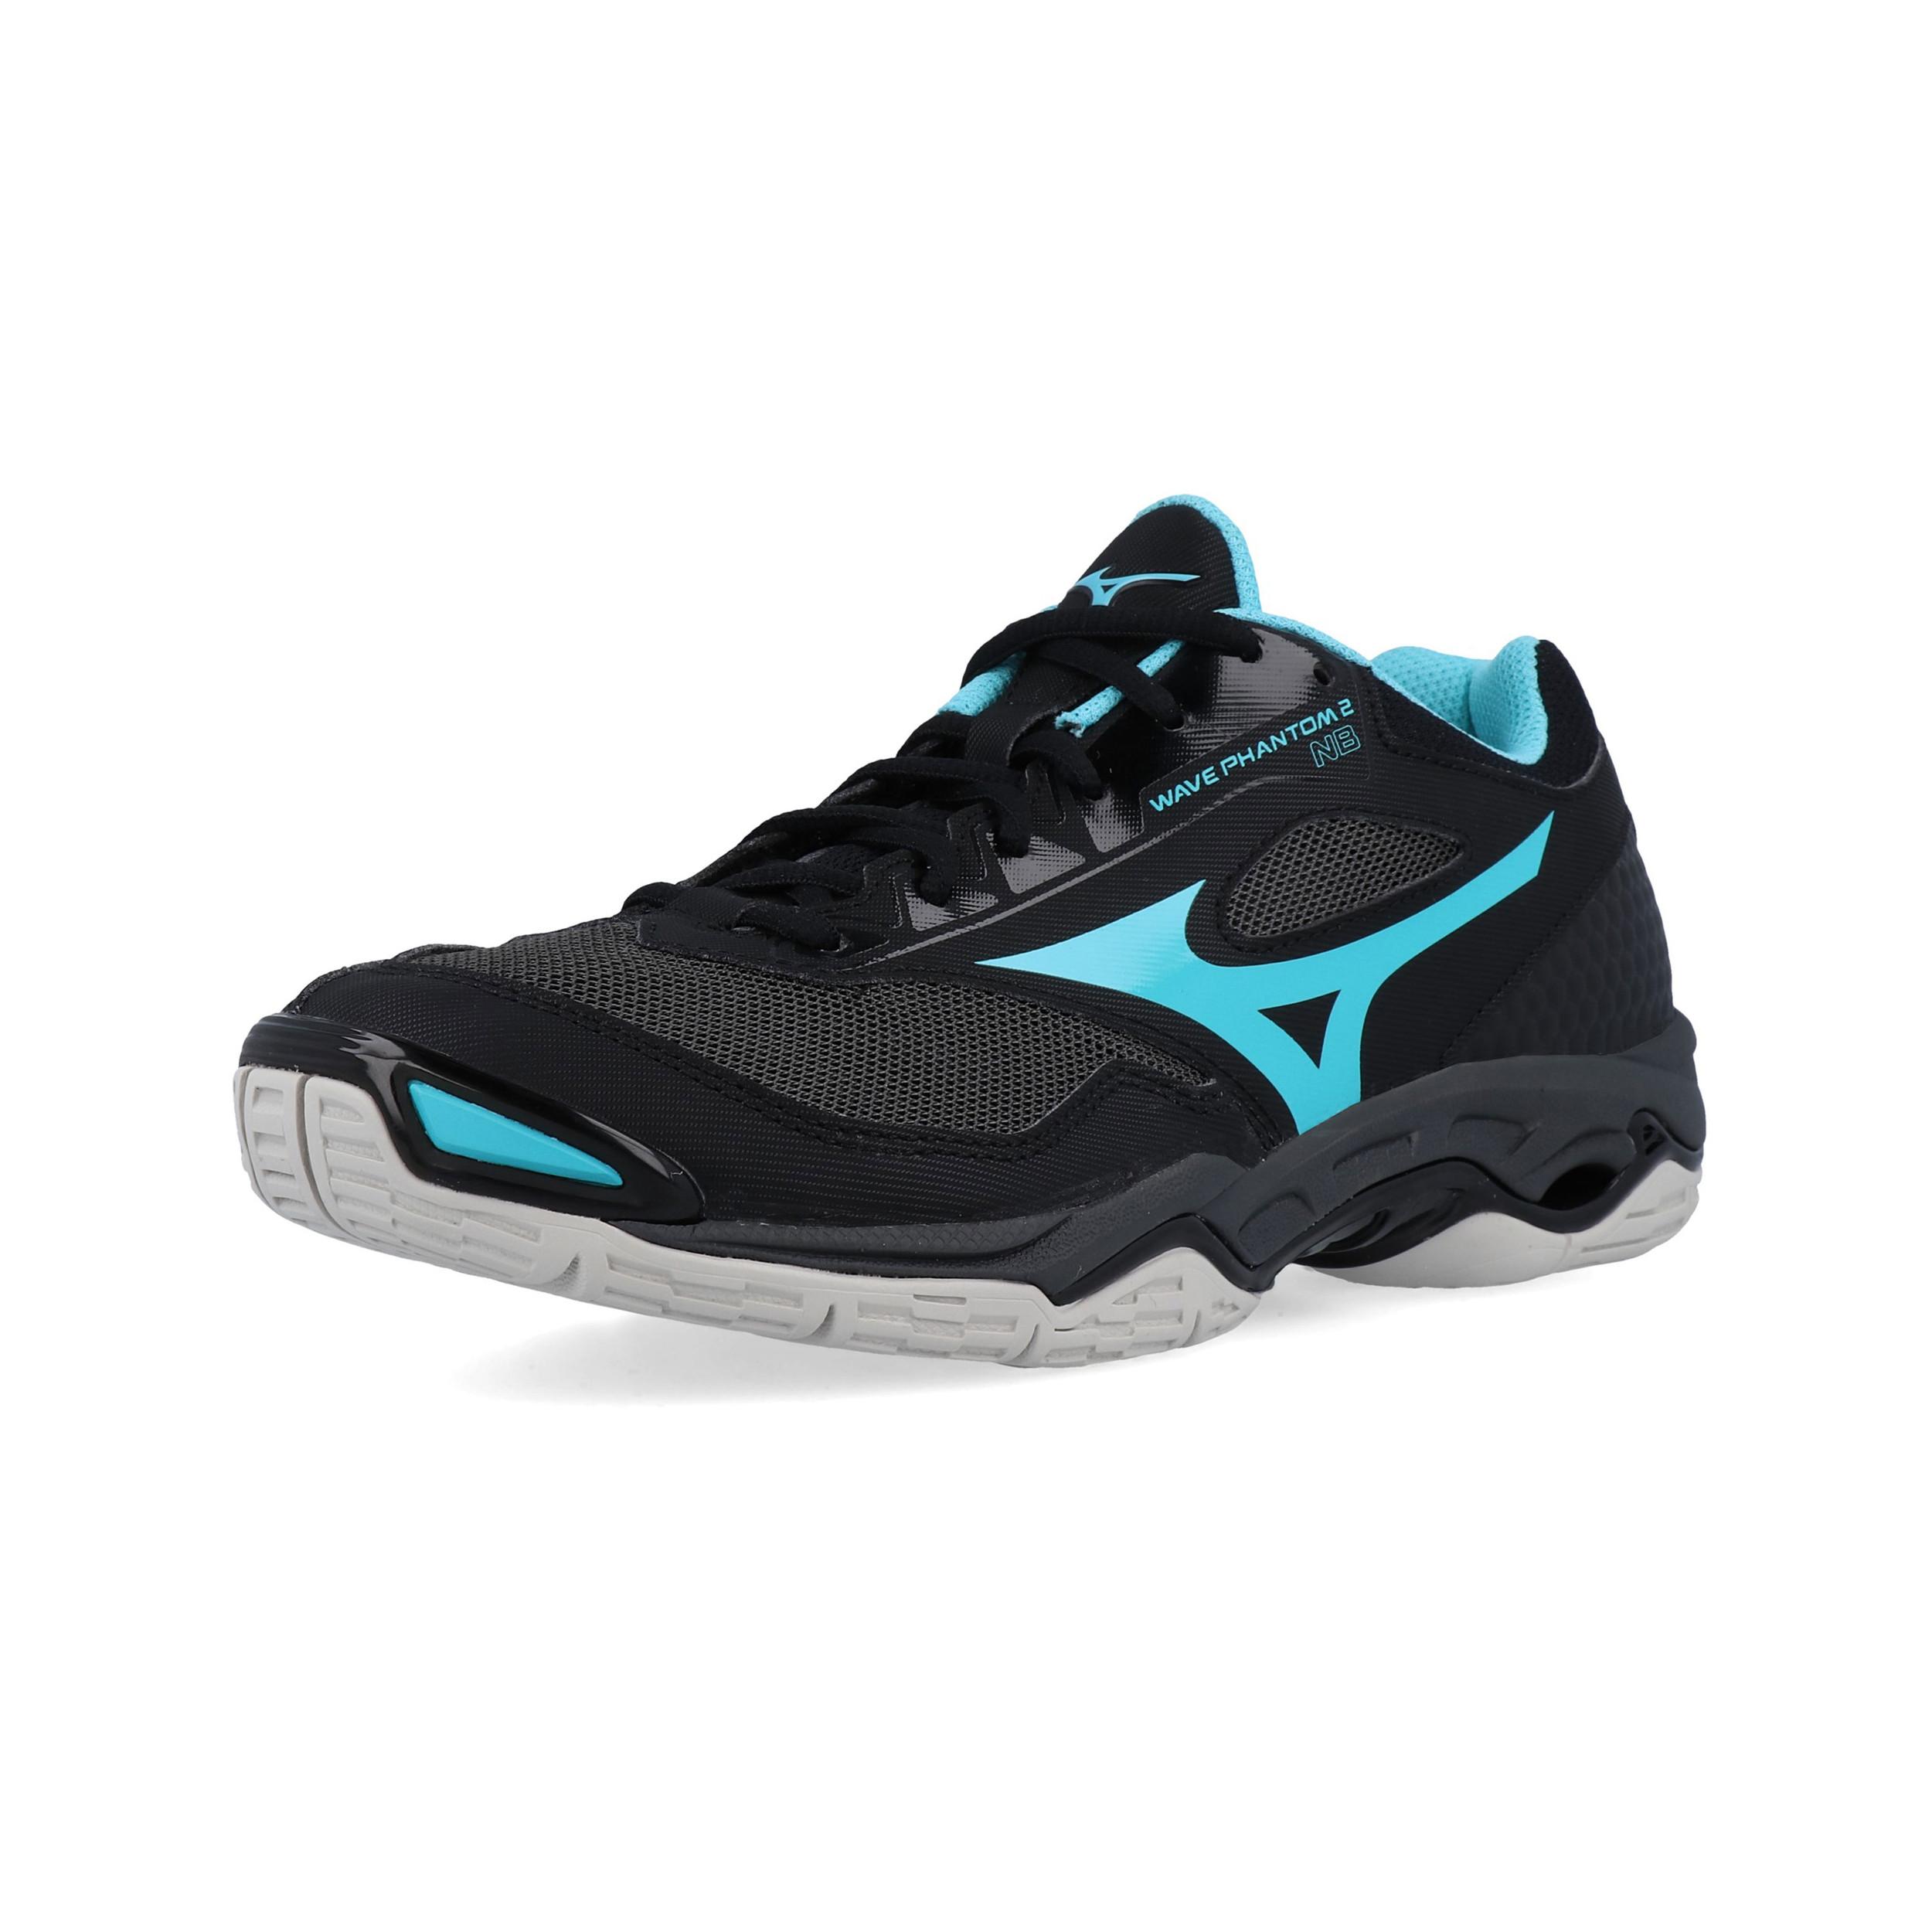 f7af775d6b Mizuno Womens Wave Phantom 2 NB Indoor Court Shoes Black Sports Netball